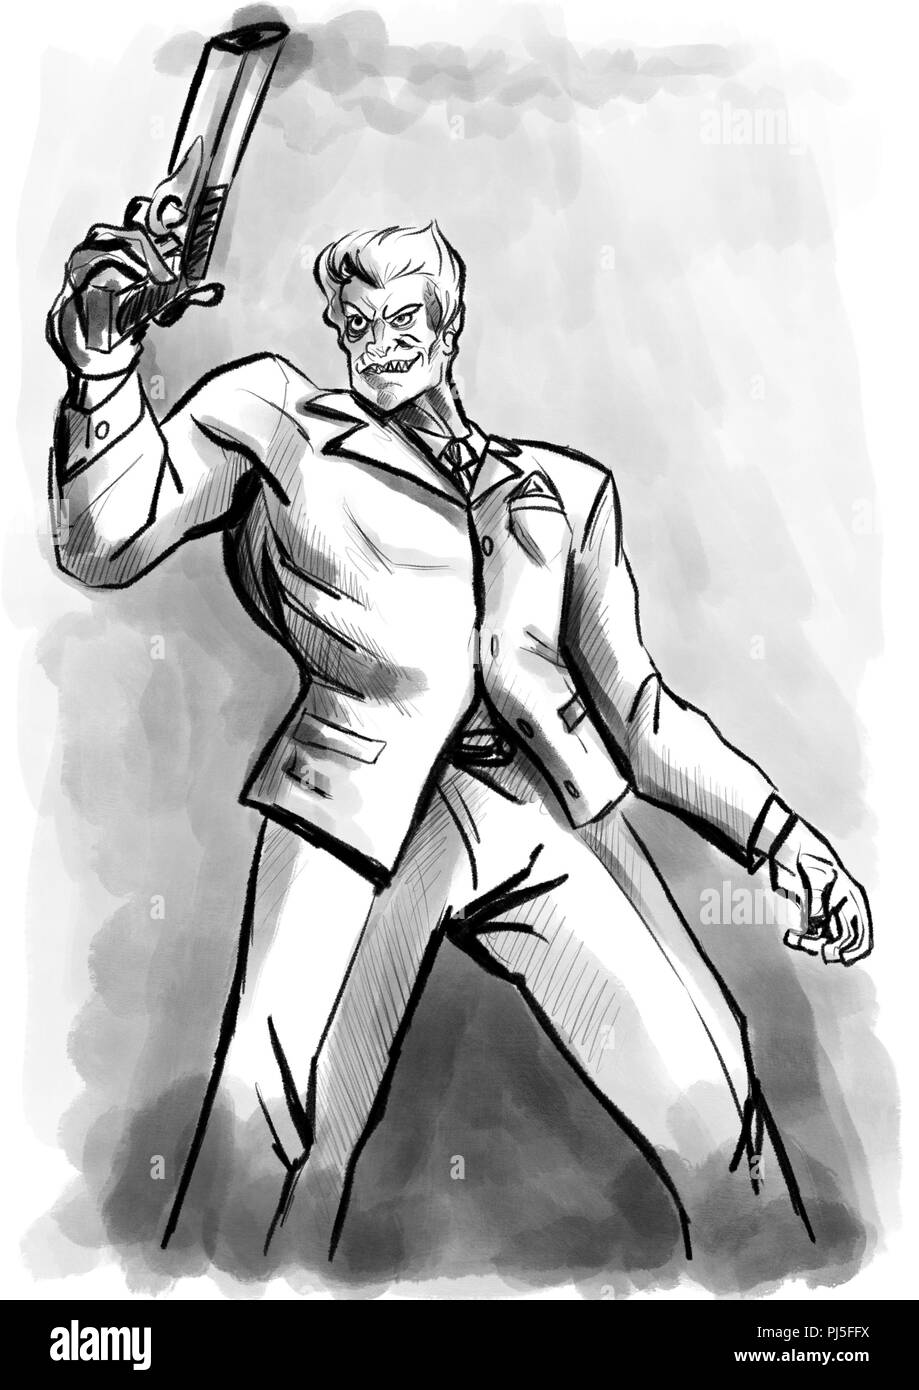 Gangster Or Hitman Illustration Stock Photo Alamy